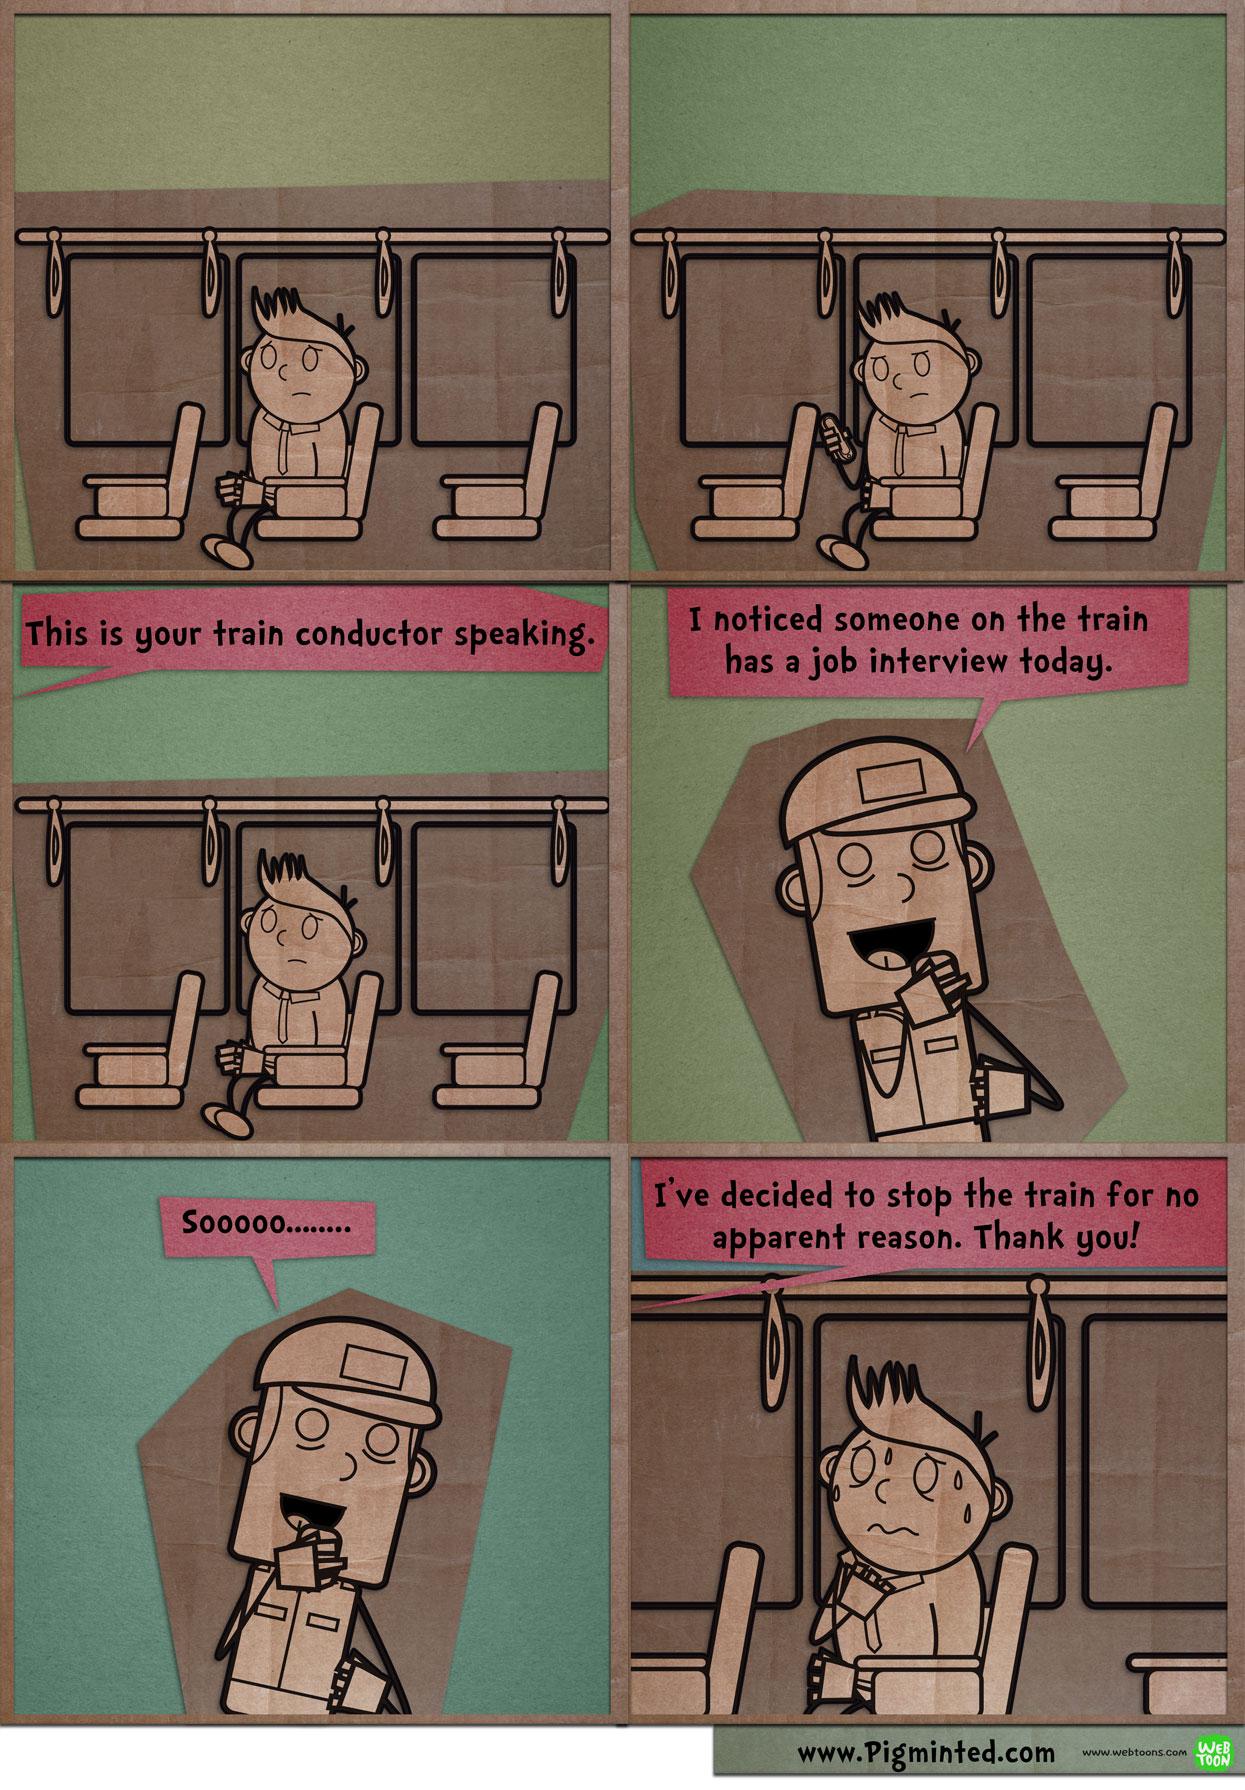 Life with public transportation